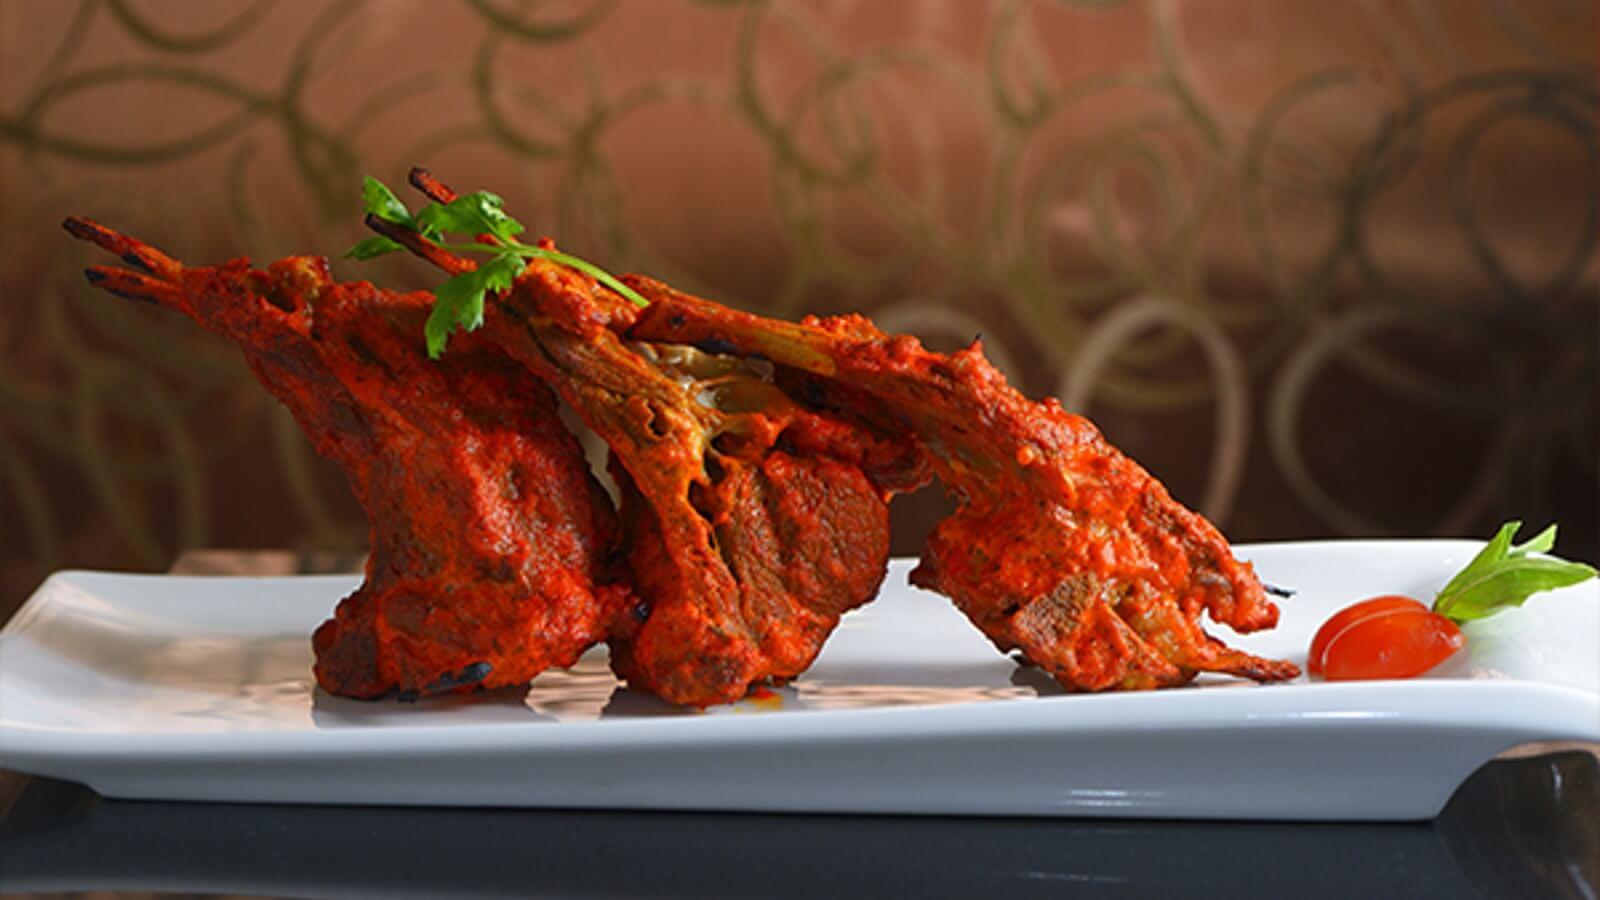 Monkey's Indian Cuisine